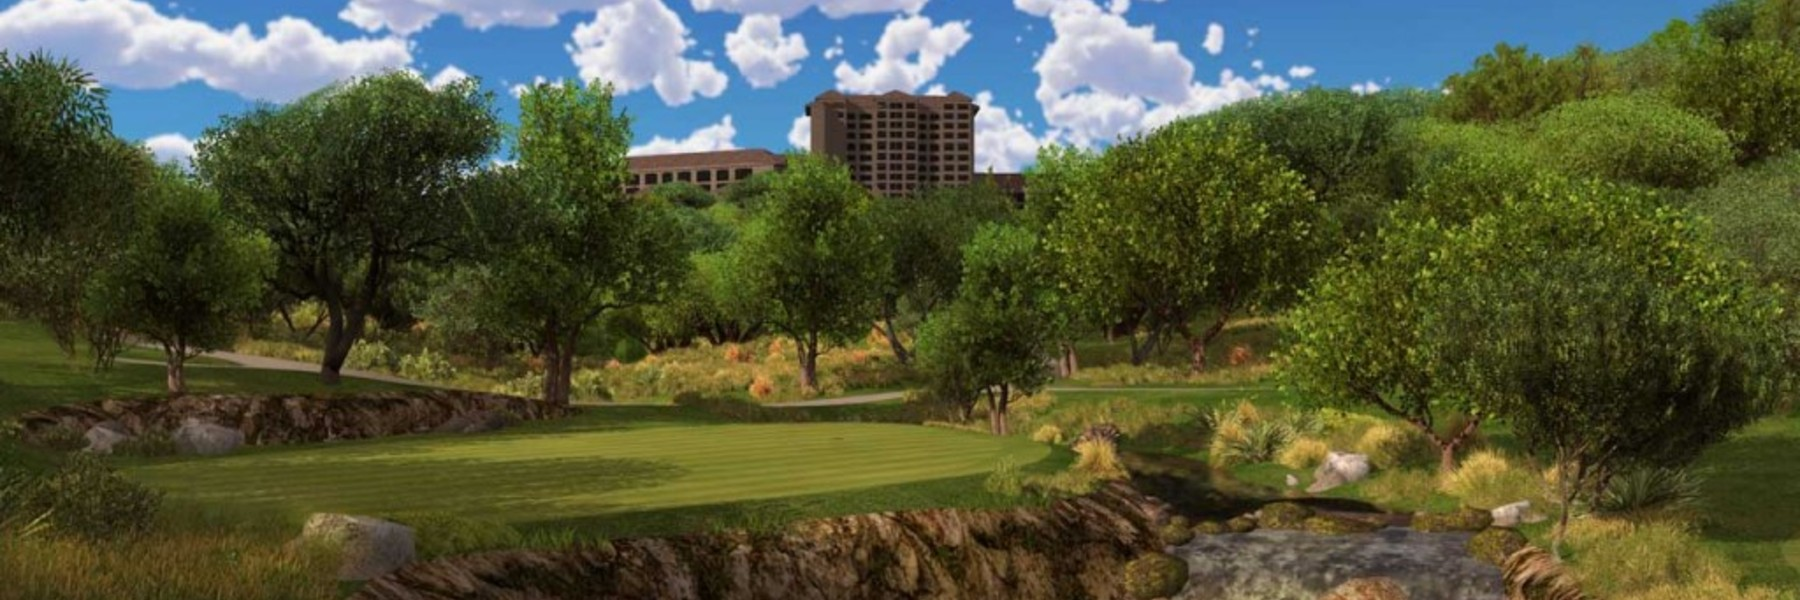 Golf Vacation Package - Omni Barton Creek Golf Resort - Fazio Foothills Course